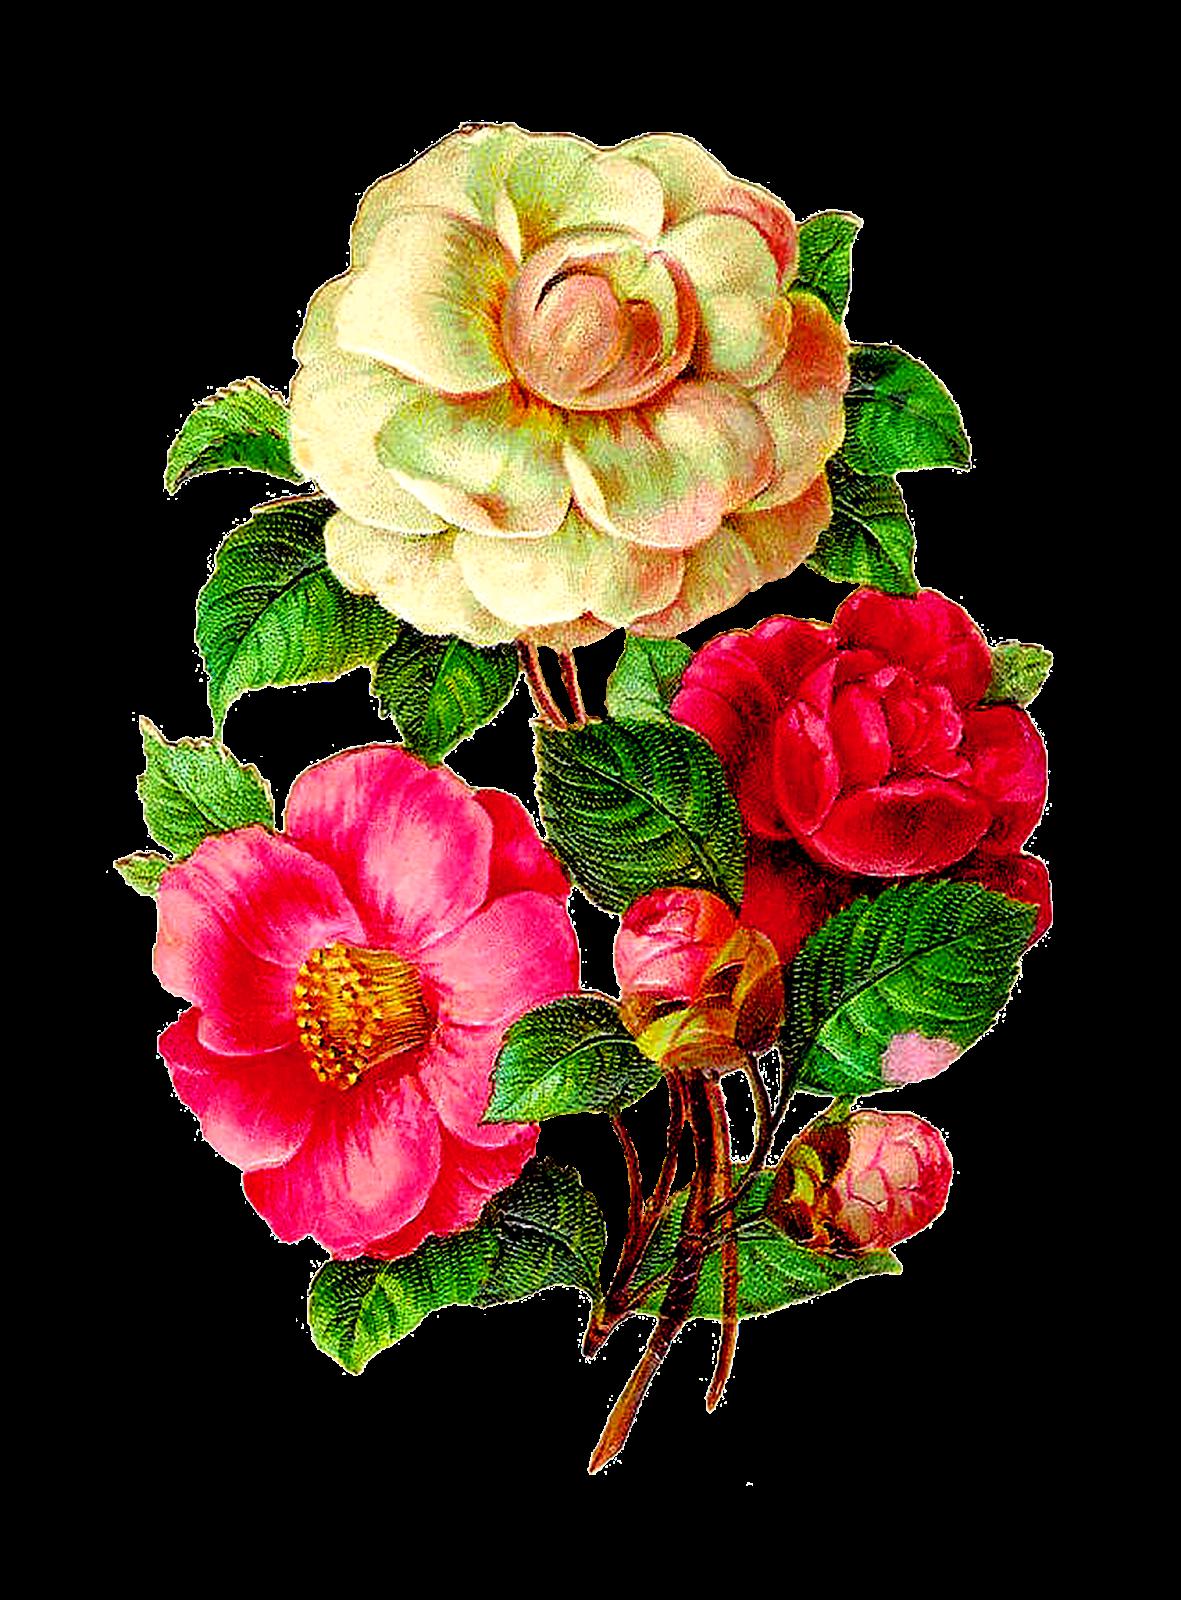 Afbeeldingsresultaat voor vintage flowers illustration